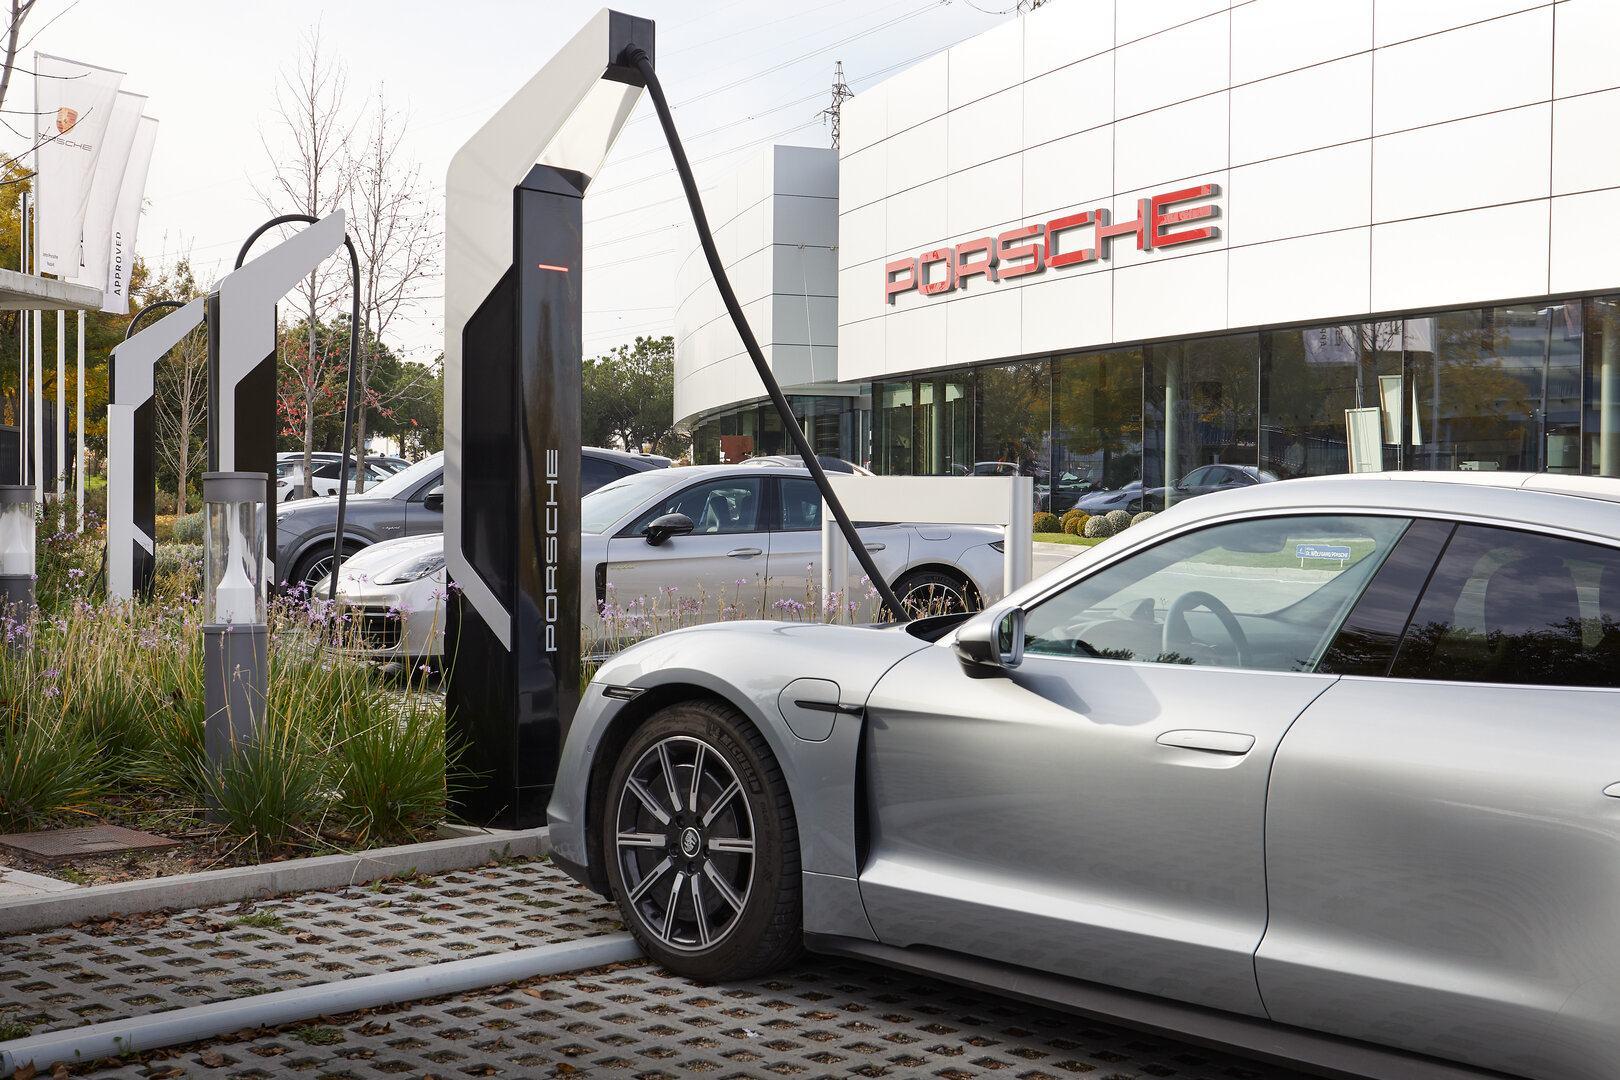 Iberdrola y Porsche se alían para instalar puntos de recarga ultrarrápida en España